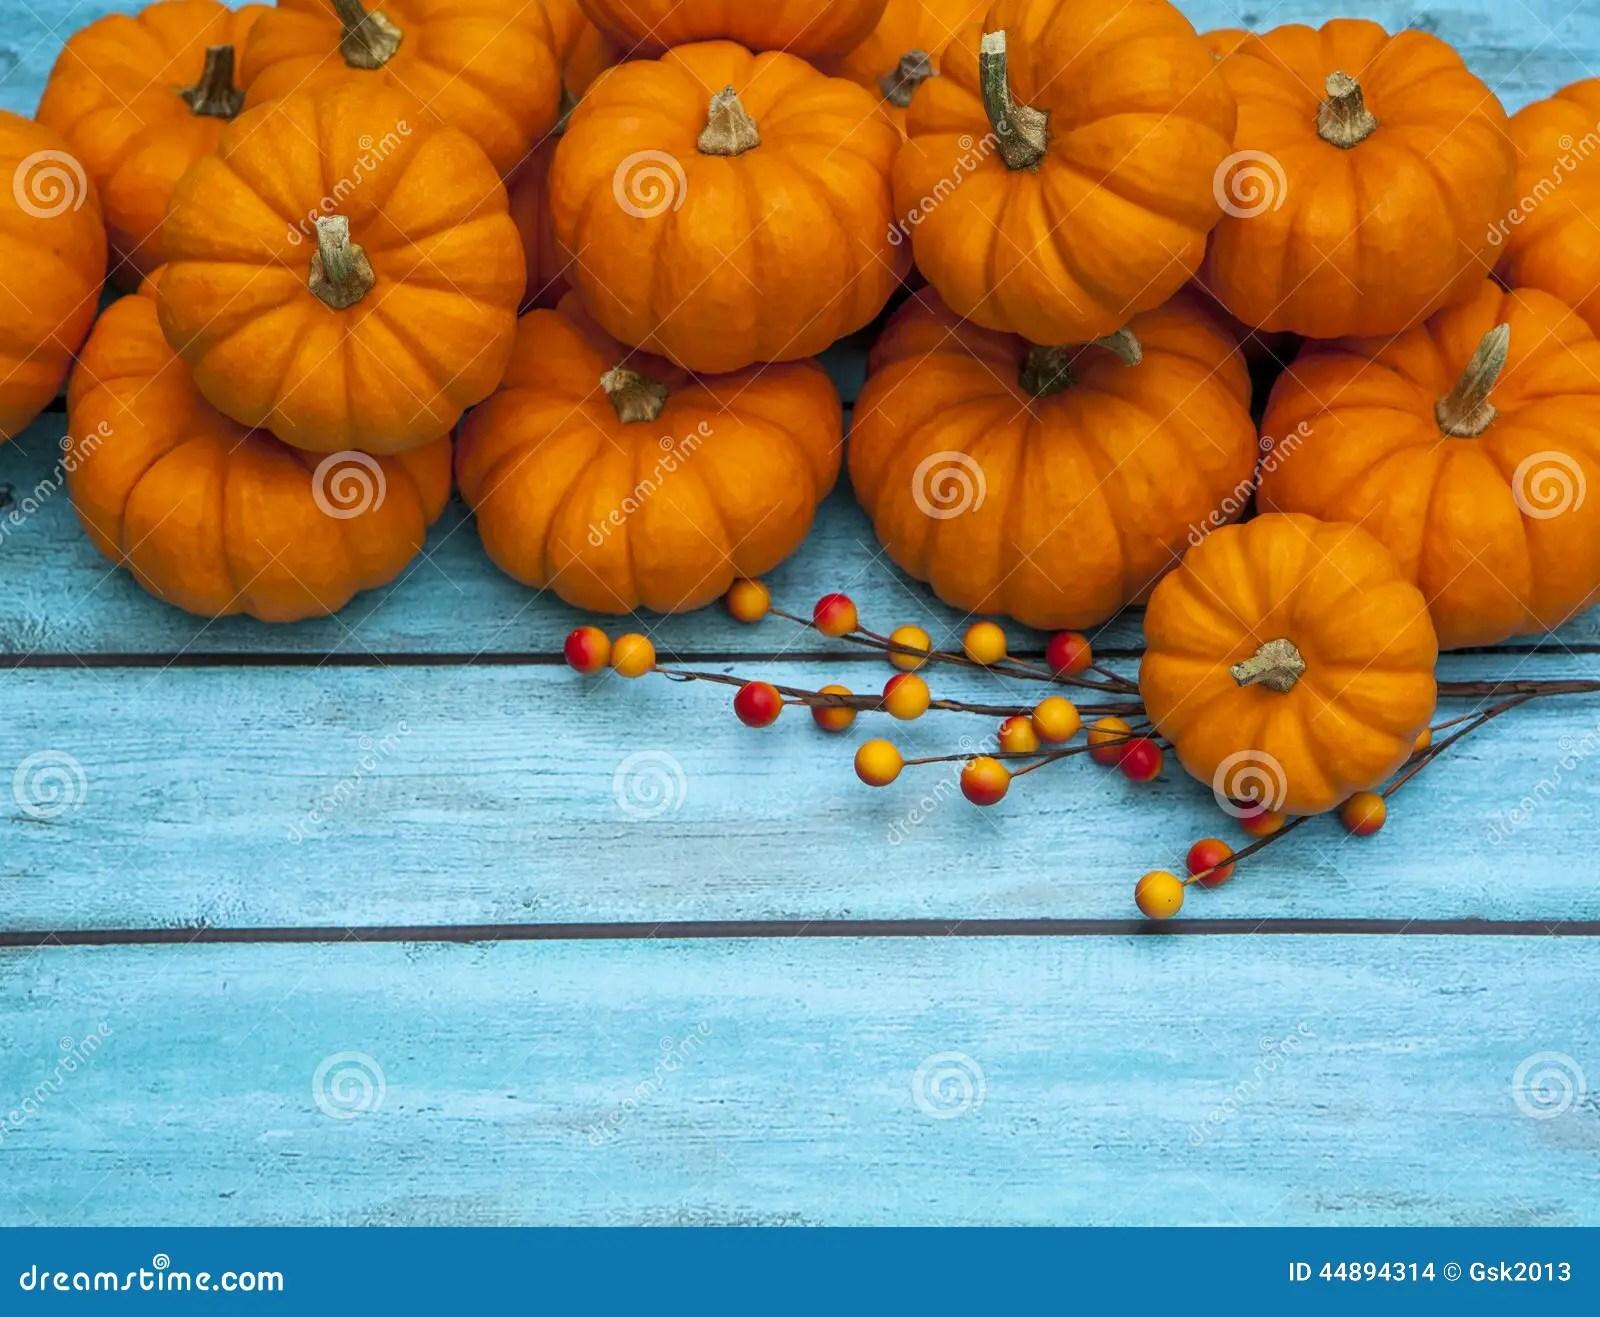 Fall Kitten Wallpaper Autumn Pumpkin Thanksgiving Background Stock Photo Image